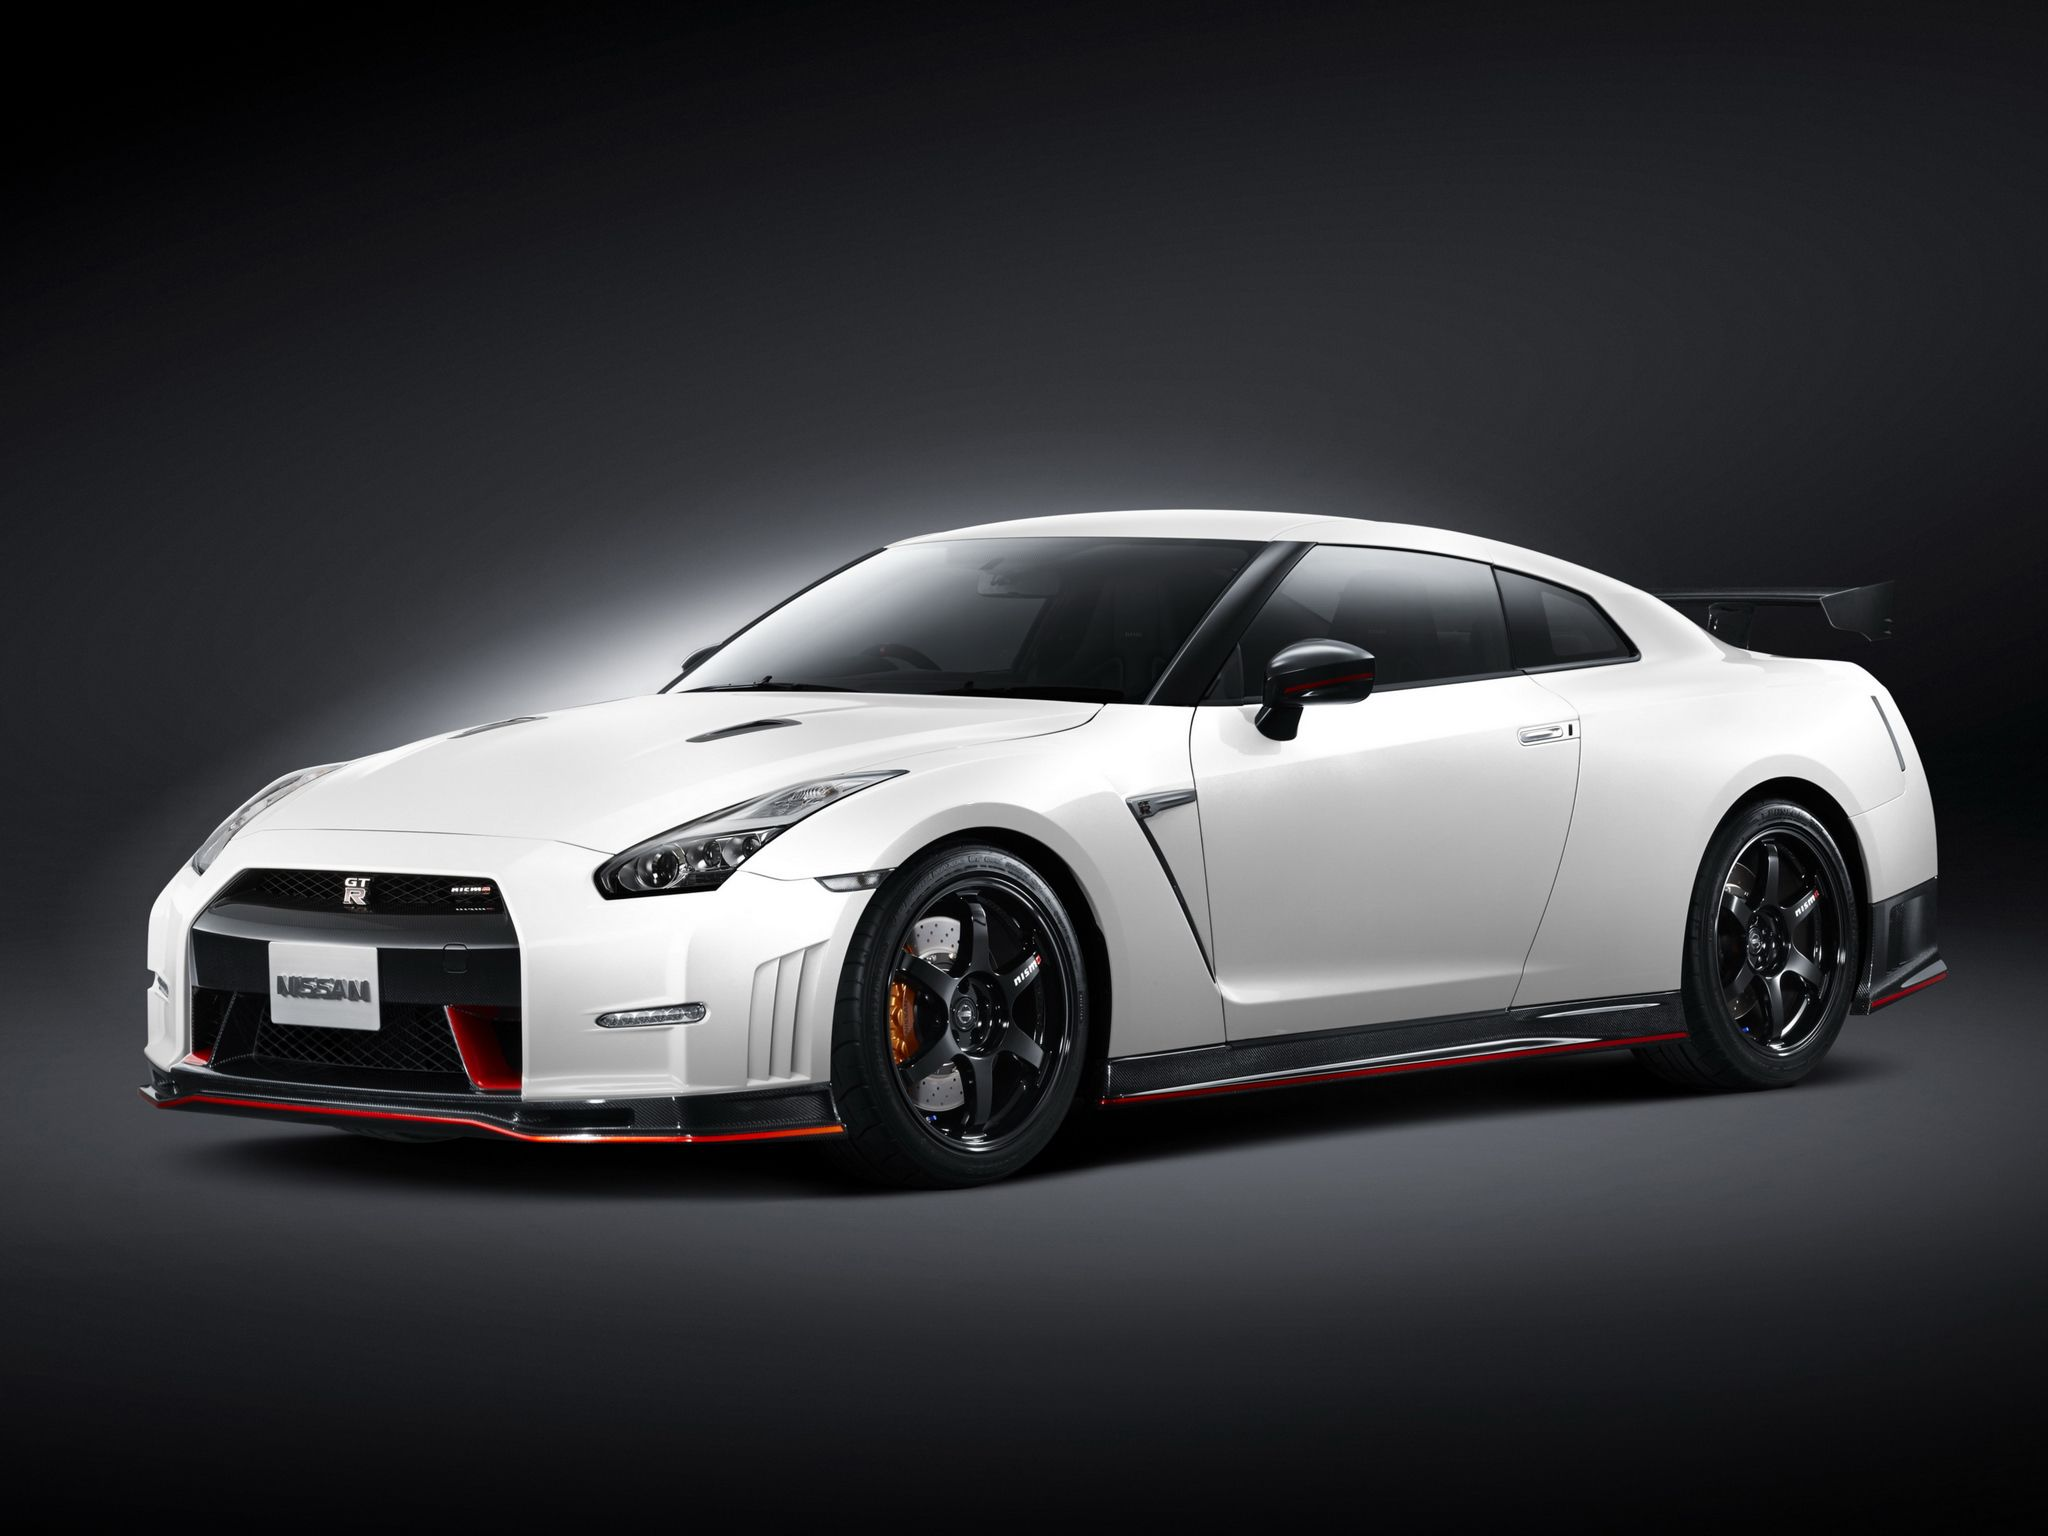 2014 Nissan Skyline Hd